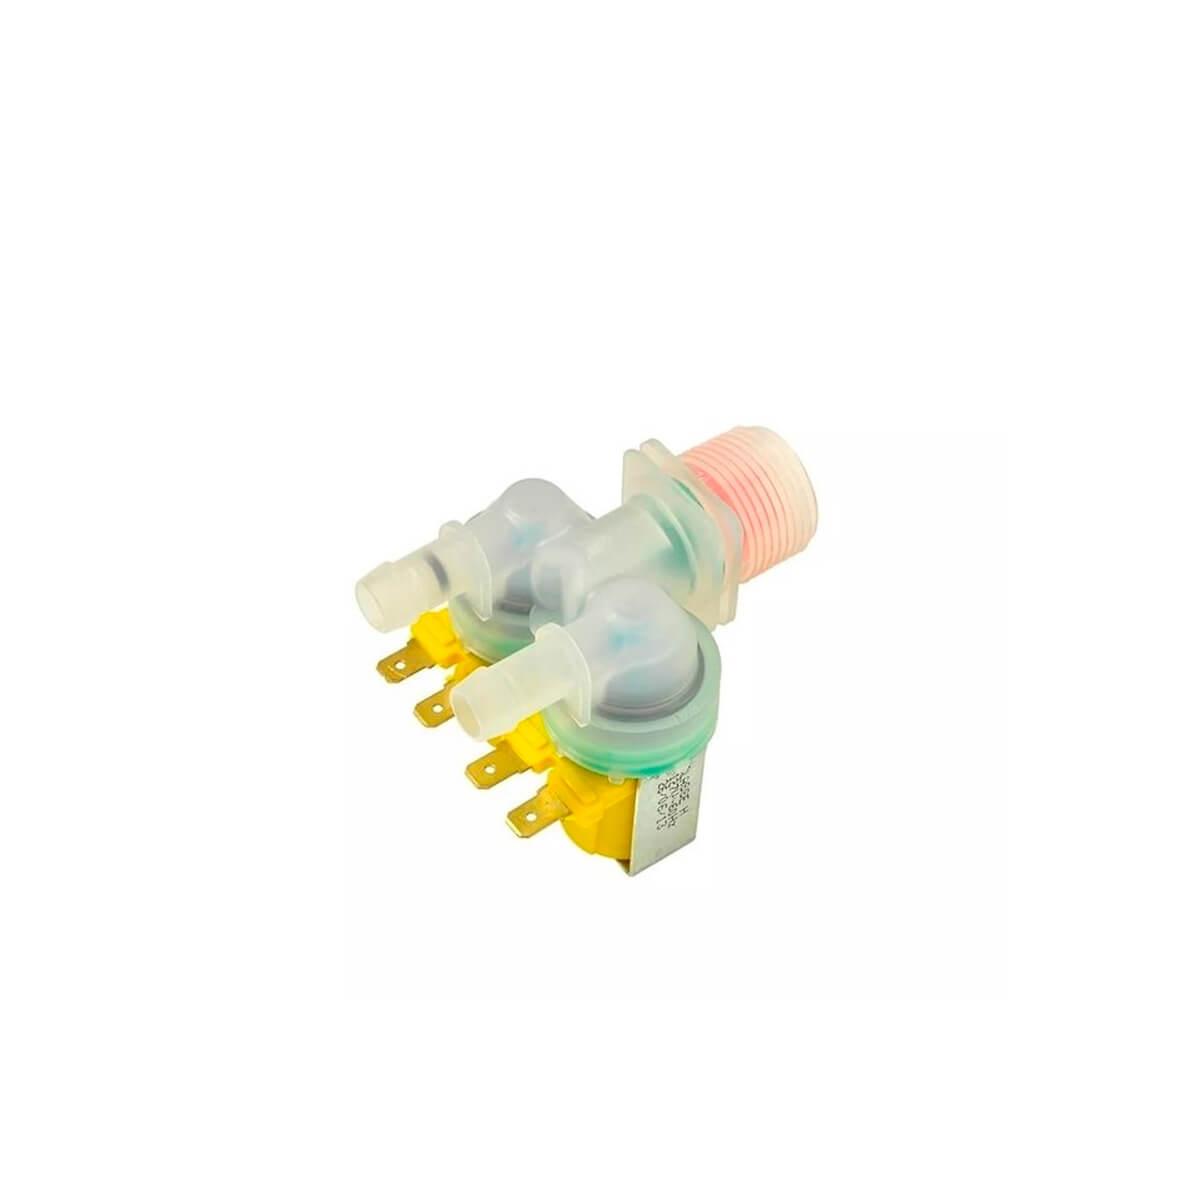 Válvula Dupla 127V Emicol Para Lavadora De Roupas Electrolux Rosca Fina - 64287483 / 9764081 / 64287453